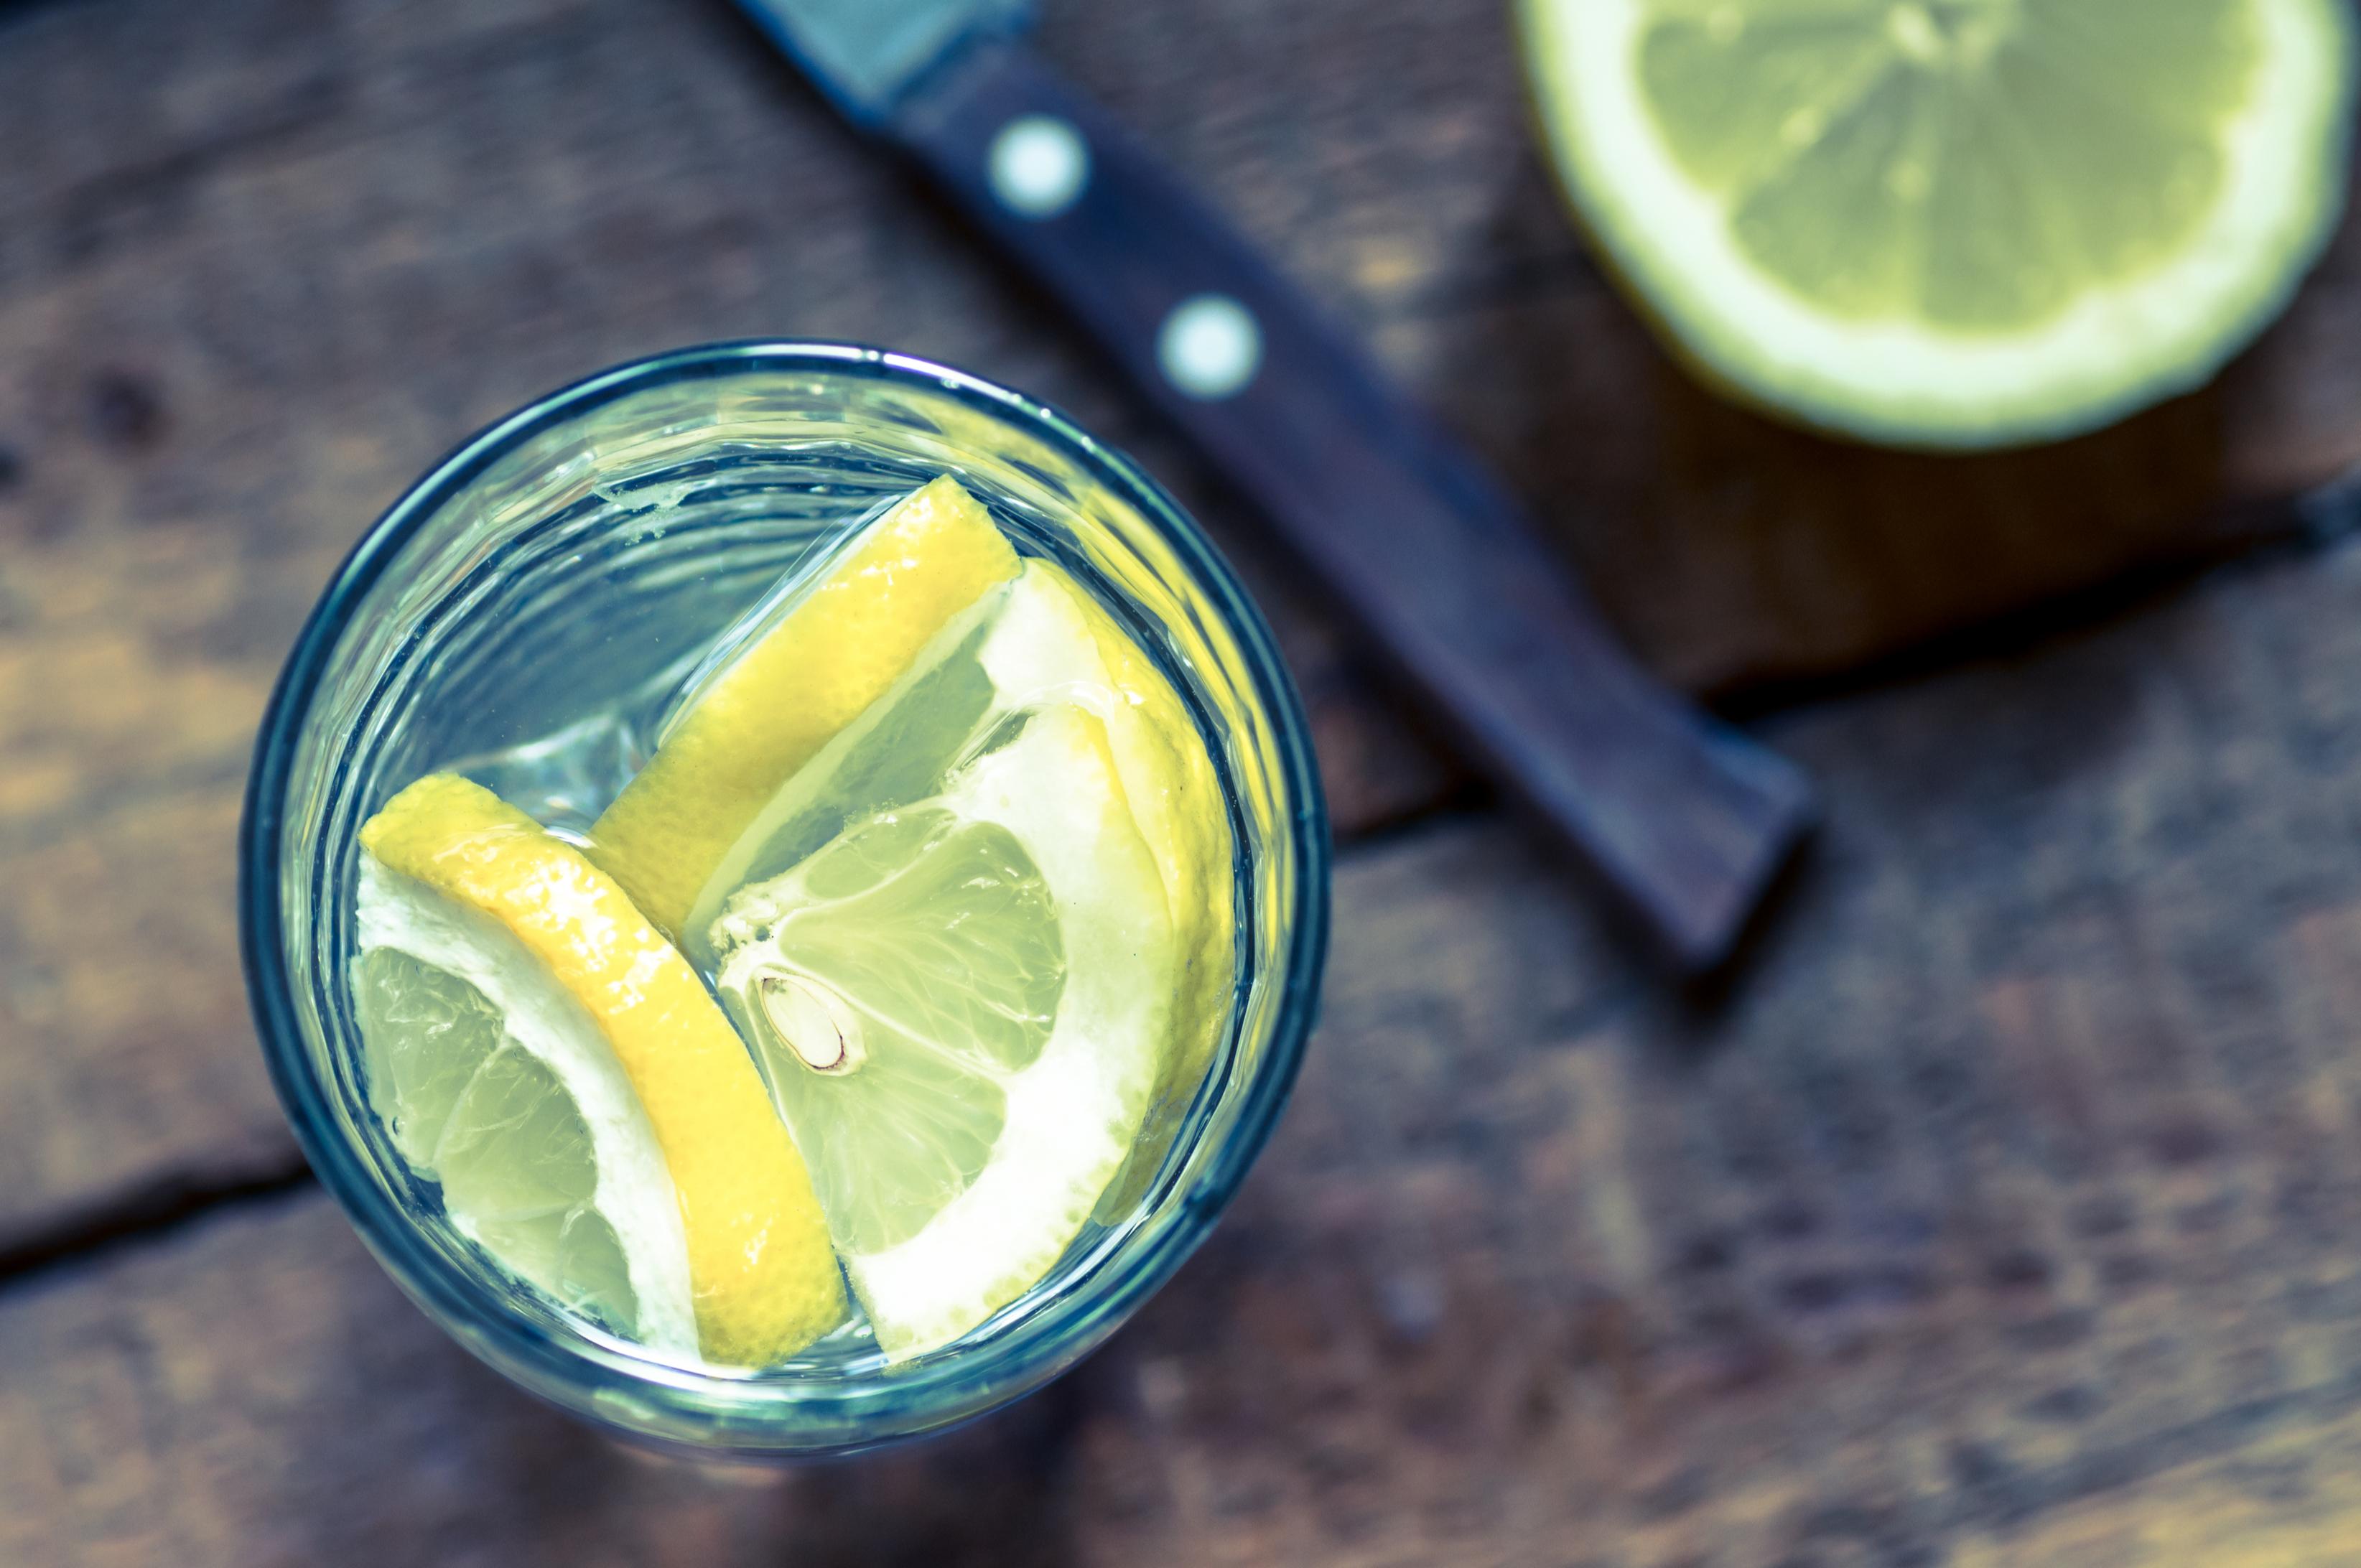 lemon water | lemon | water | lemon water benefits | health | health benefits | health benefits of lemon water